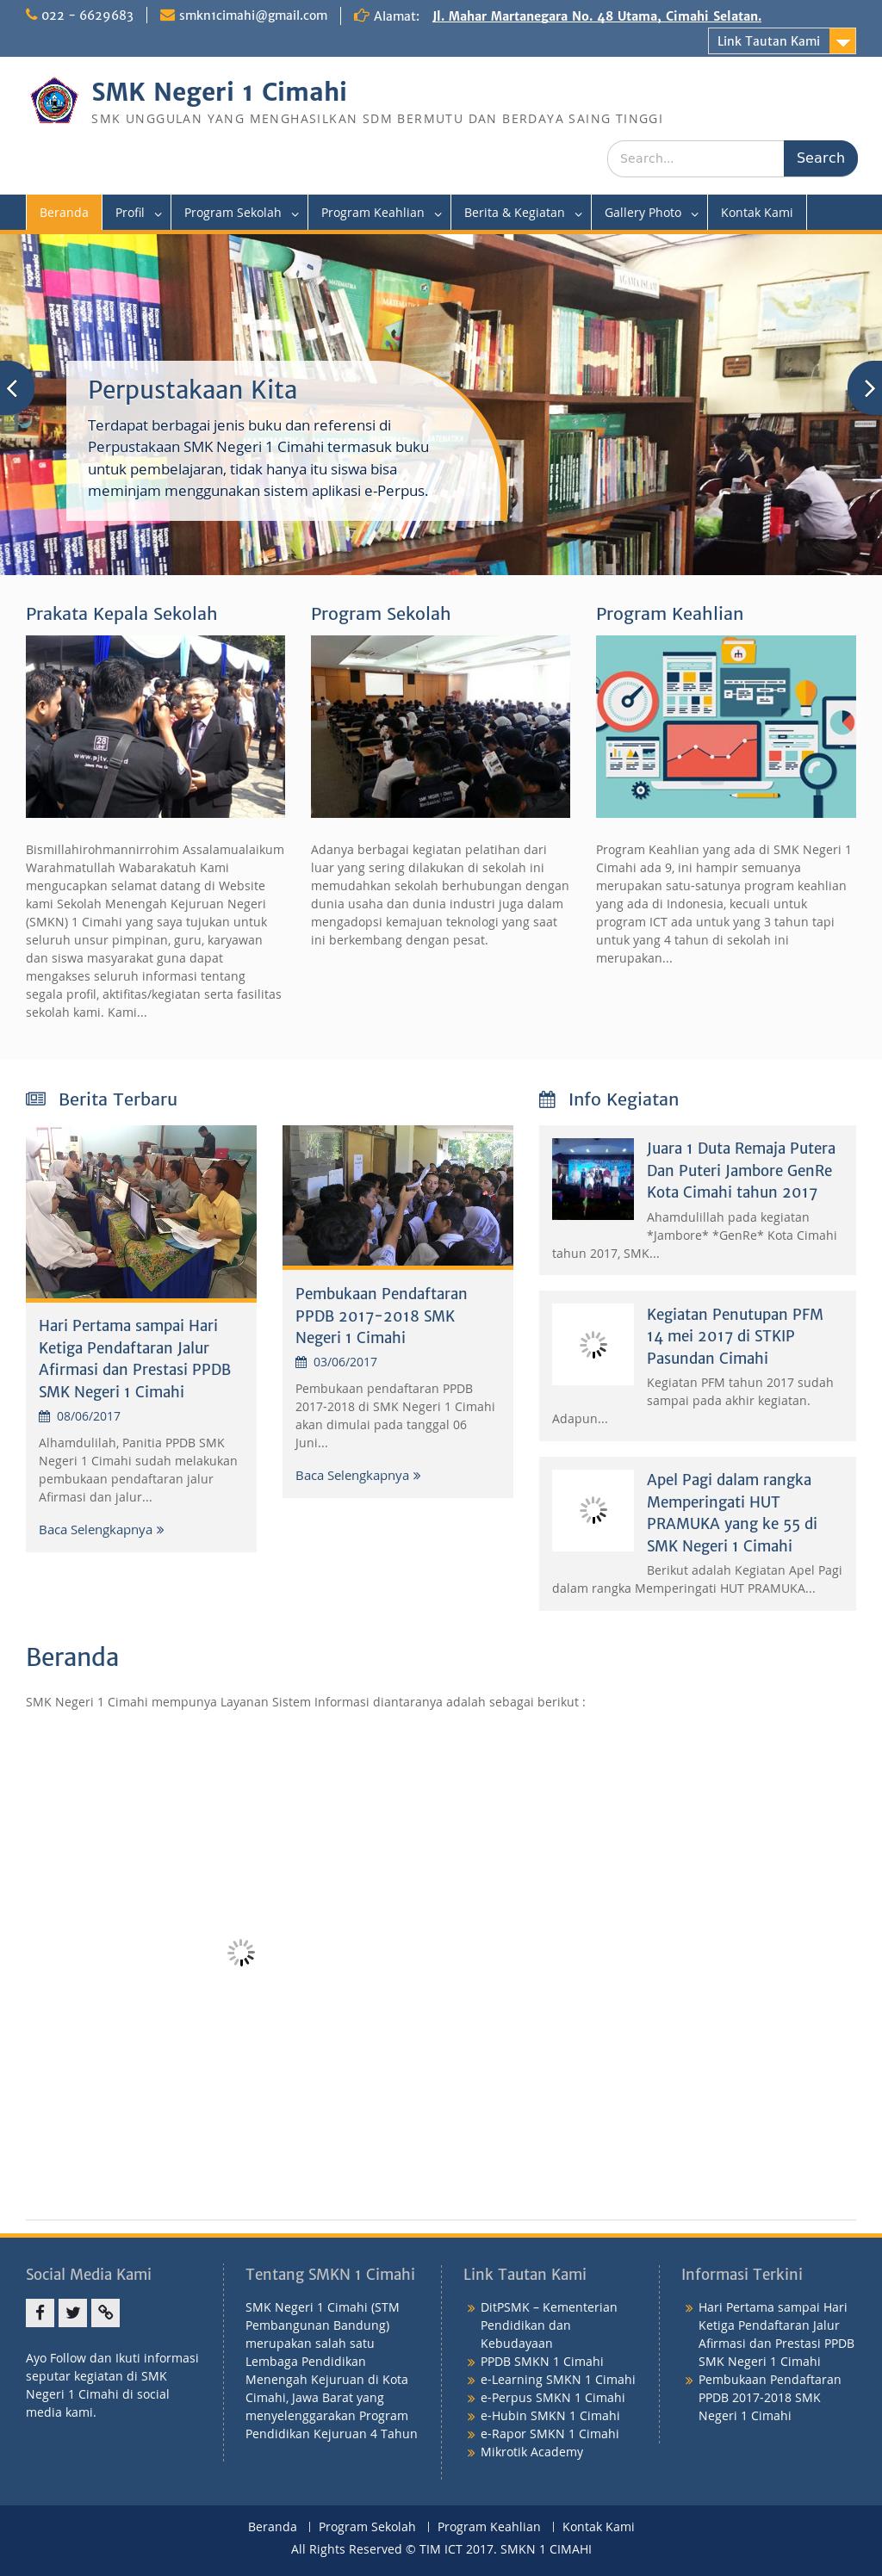 Smk Negeri 1 Cimahi Competitors, Revenue and Employees